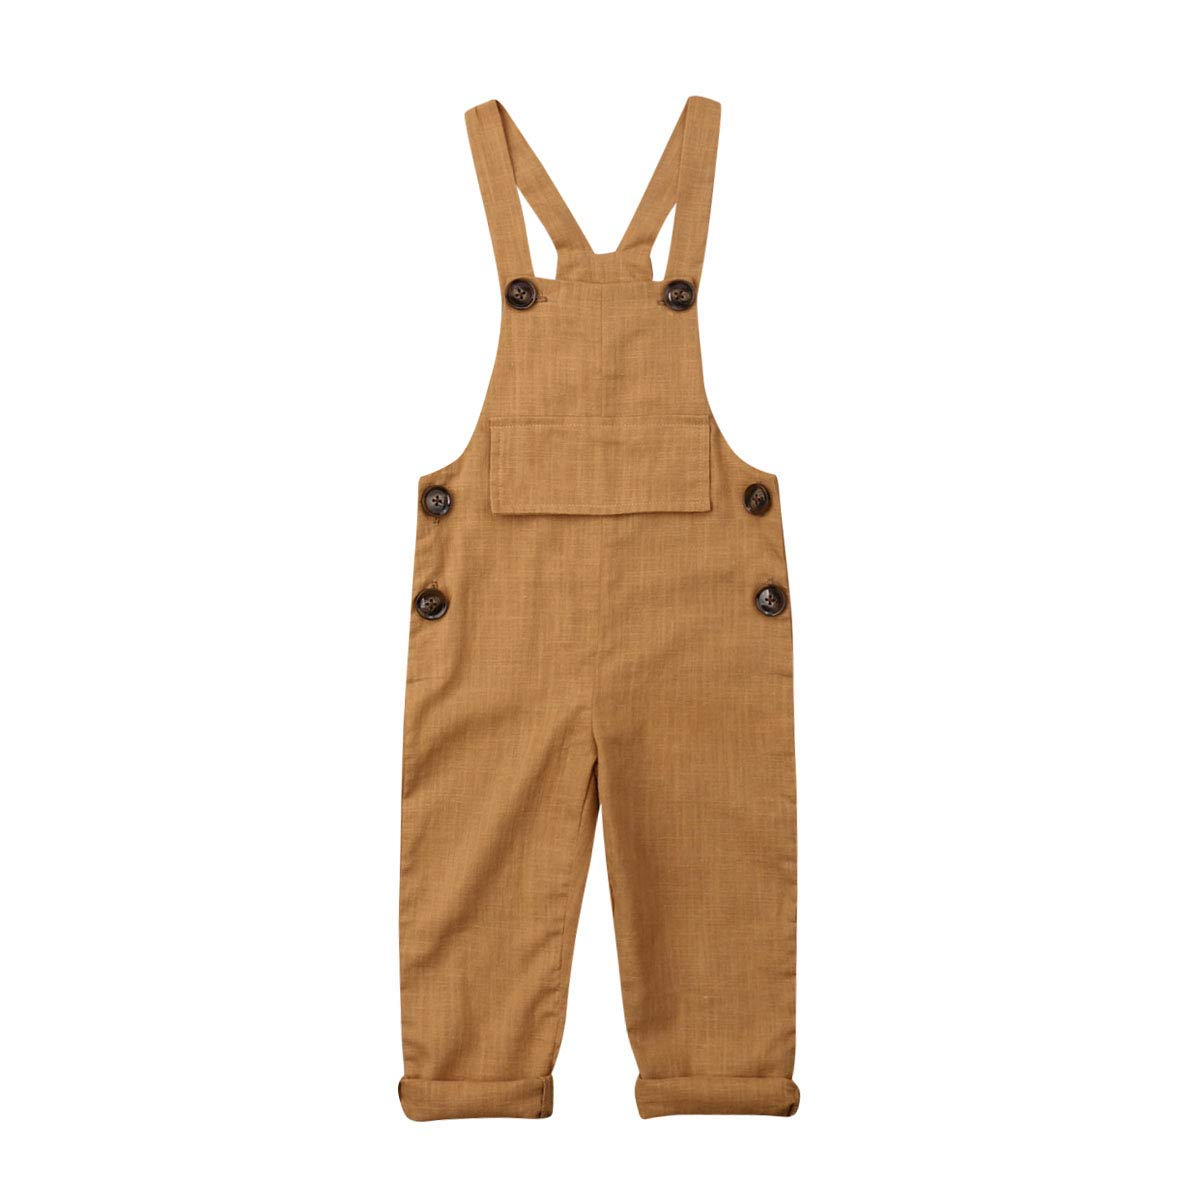 Tsafiddle 0-3T Unisex Baby Overalls Roll Up Button Summer Straps Pants Romper Suspender Bottom